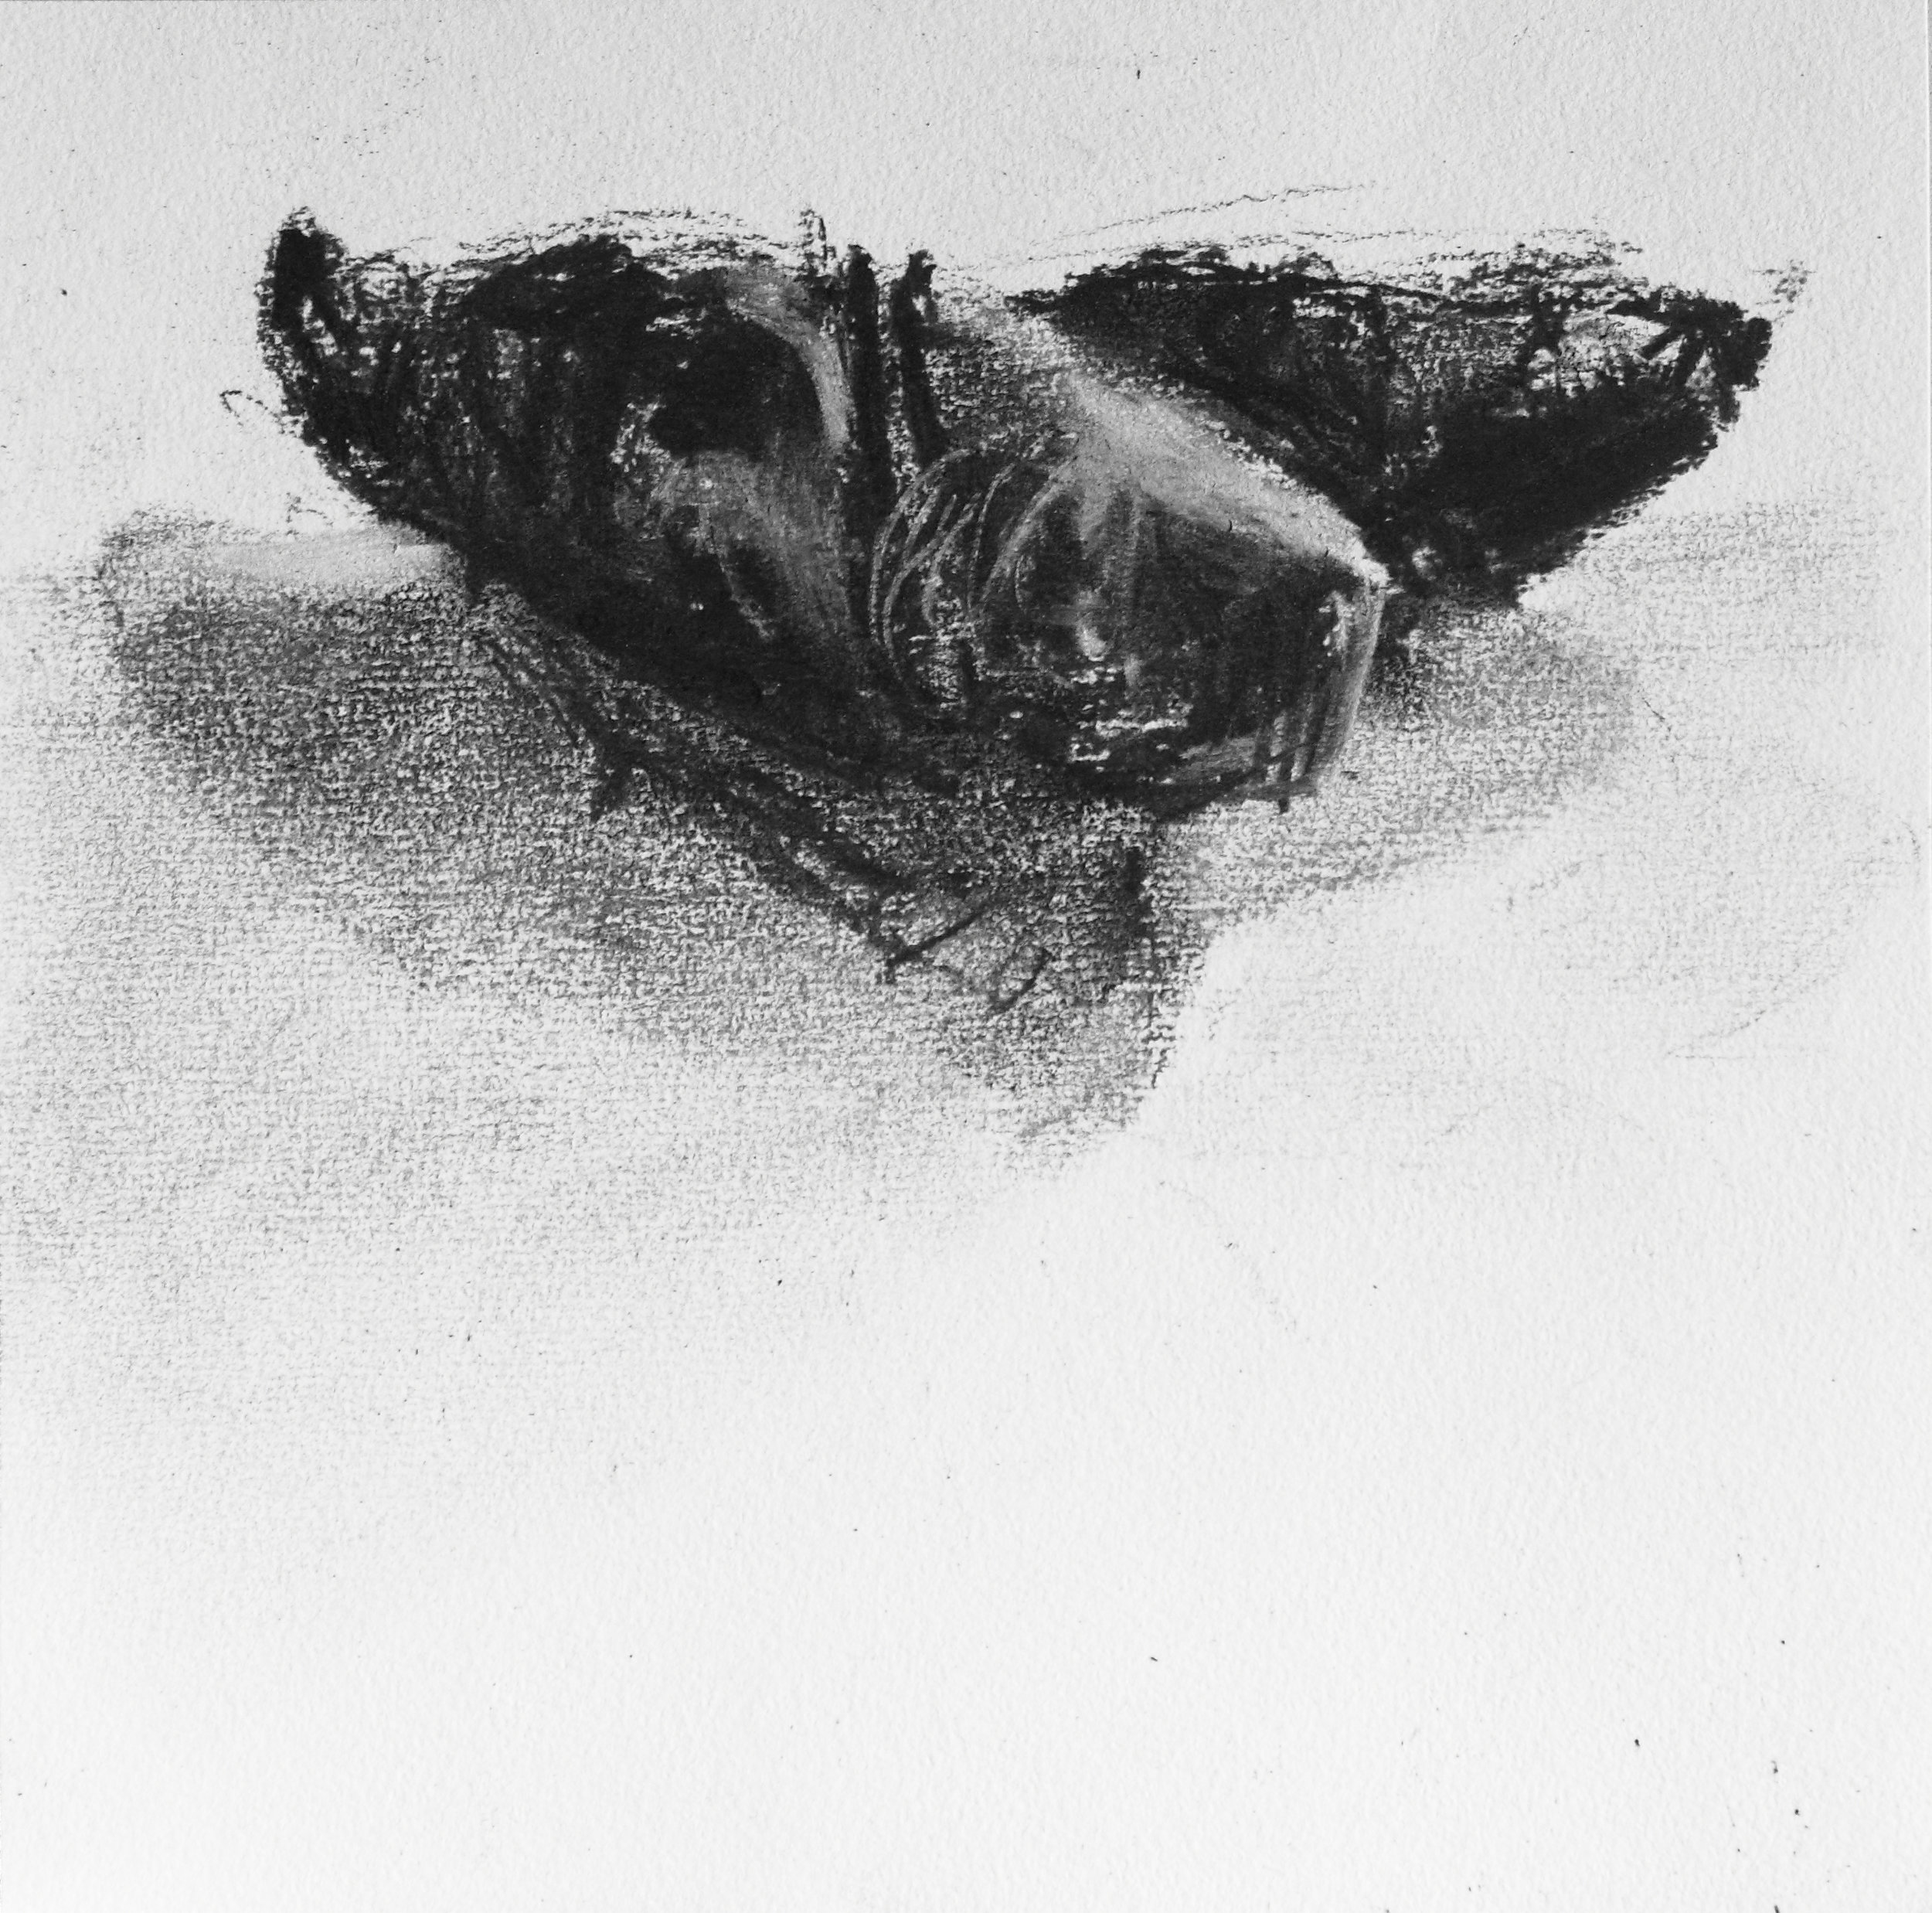 N Mason BTRW scats charcoal on paper 20x20cm IMG_5953.jpg